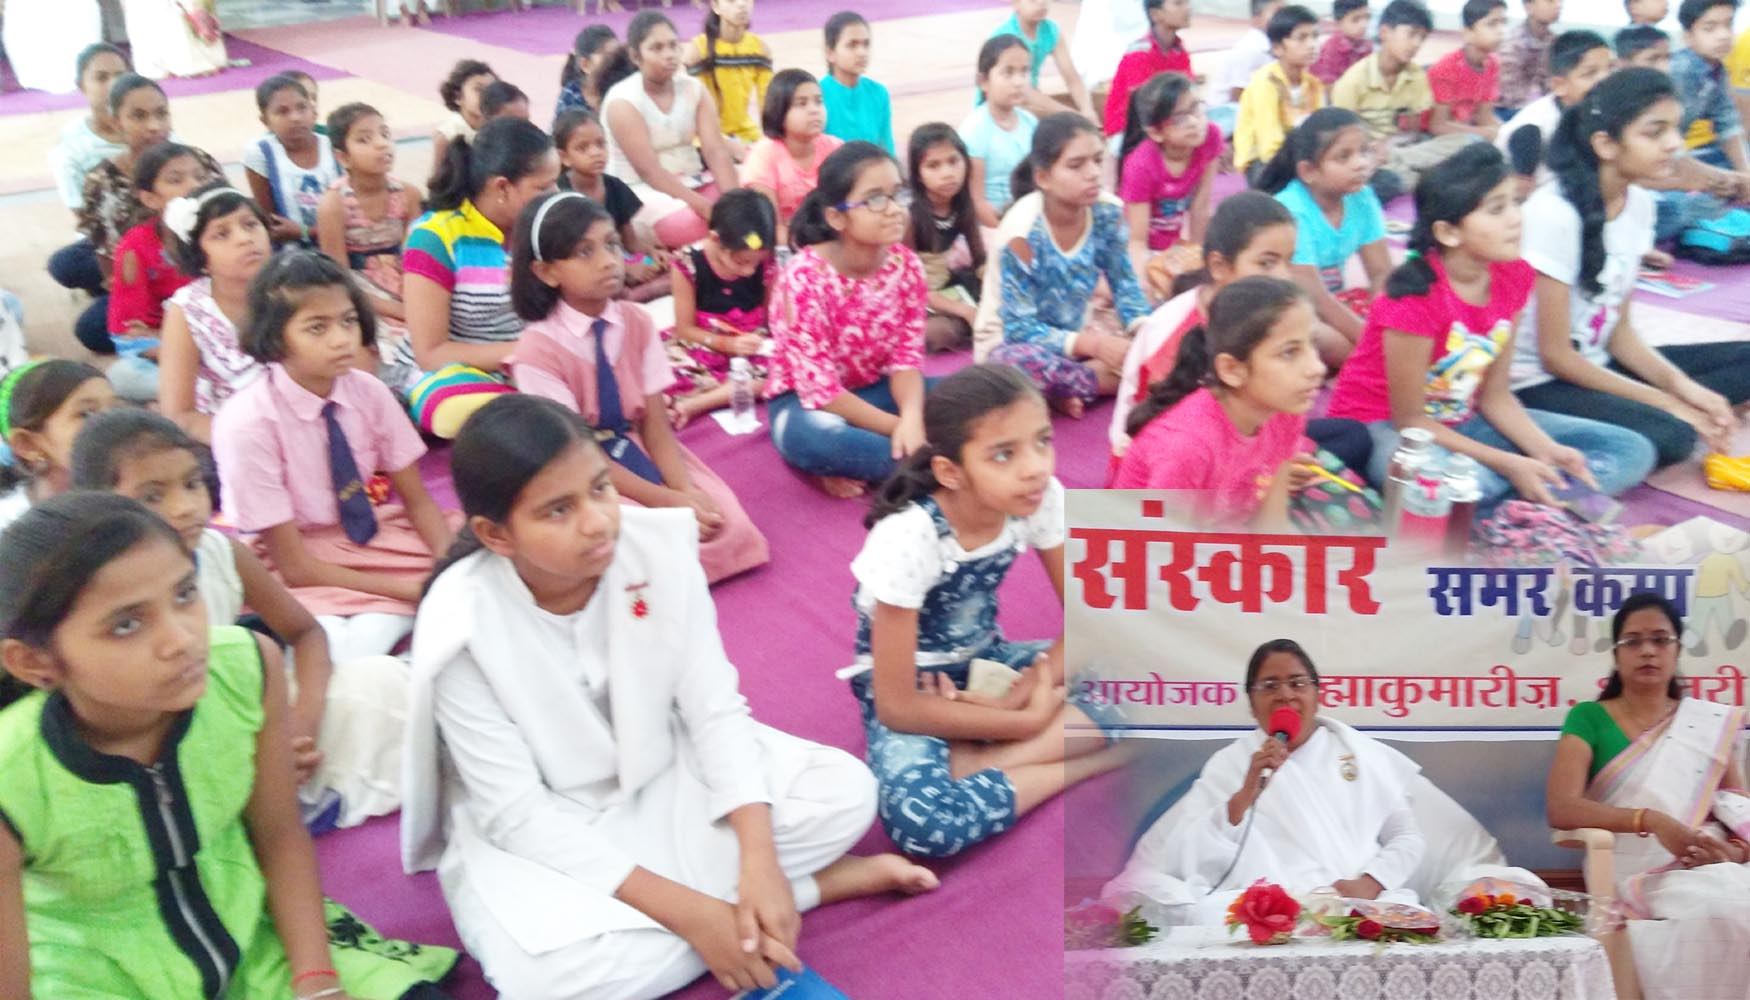 Inauguration of Summer Camp at Dhamtari, Chhattisgarh